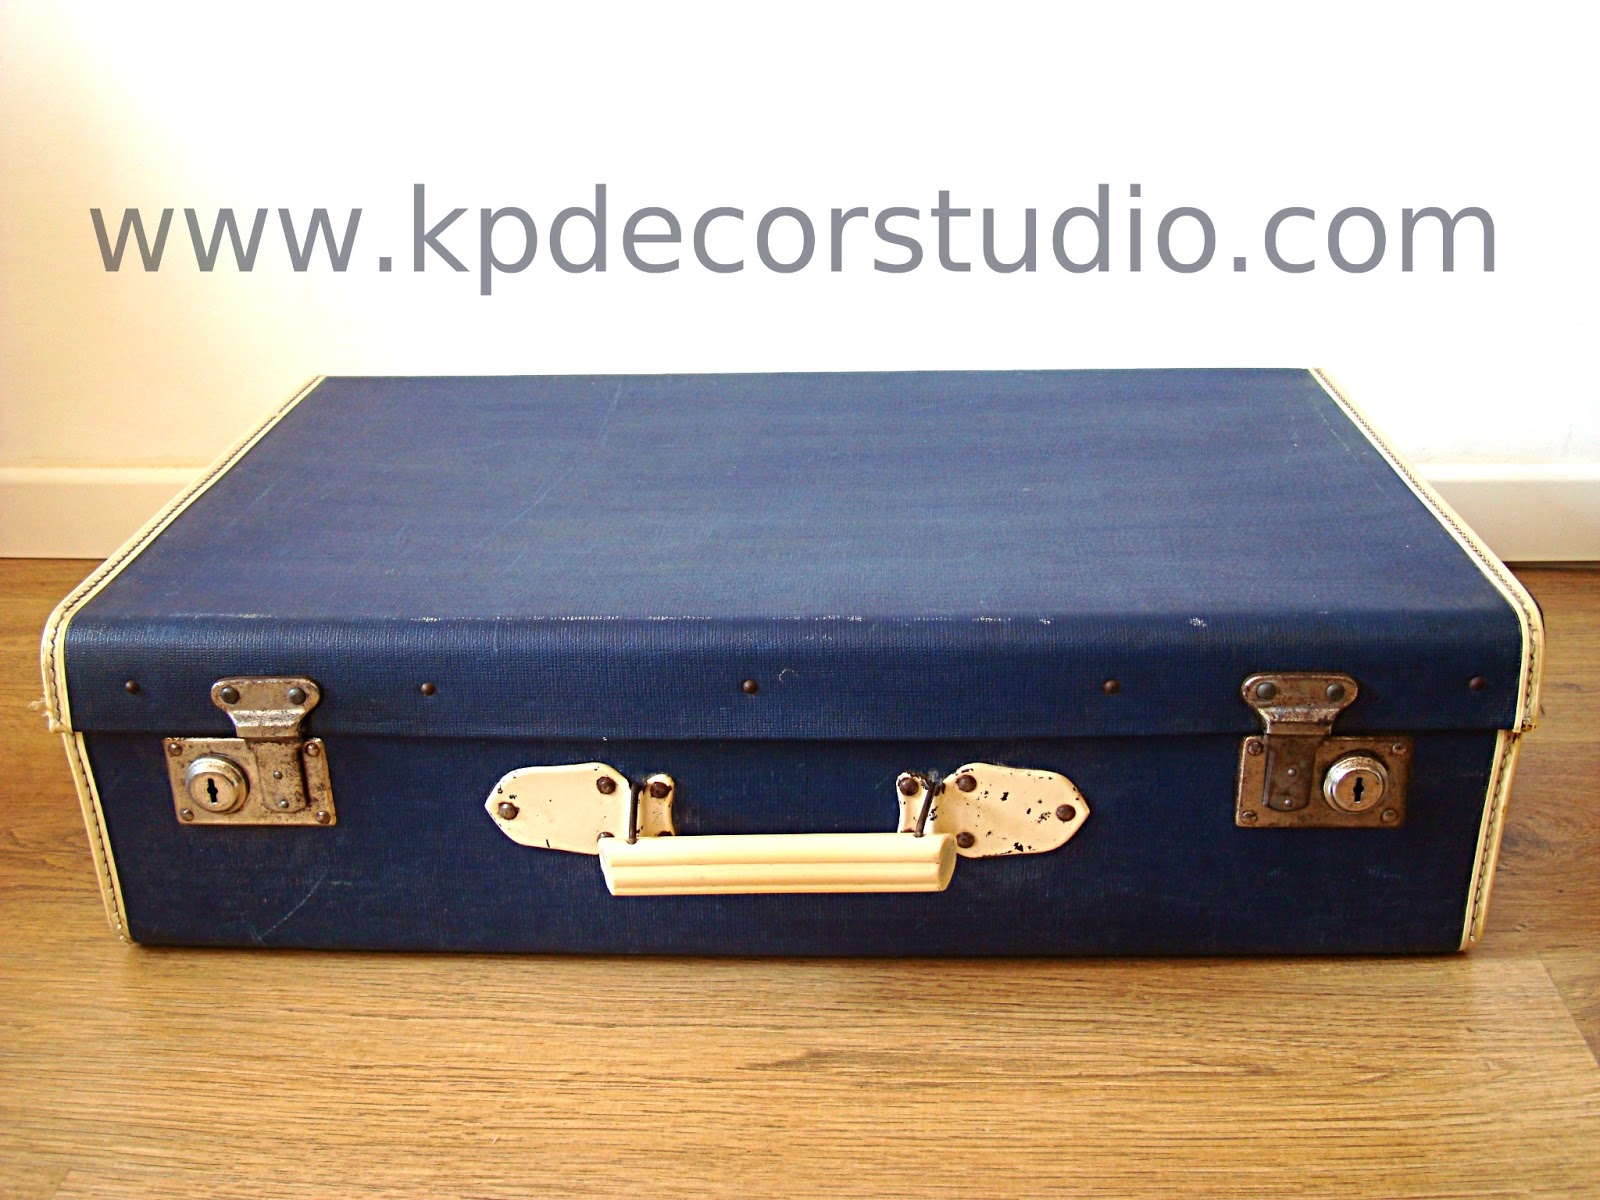 Kp tienda vintage online maleta antigua color azul for Maletas antiguas online